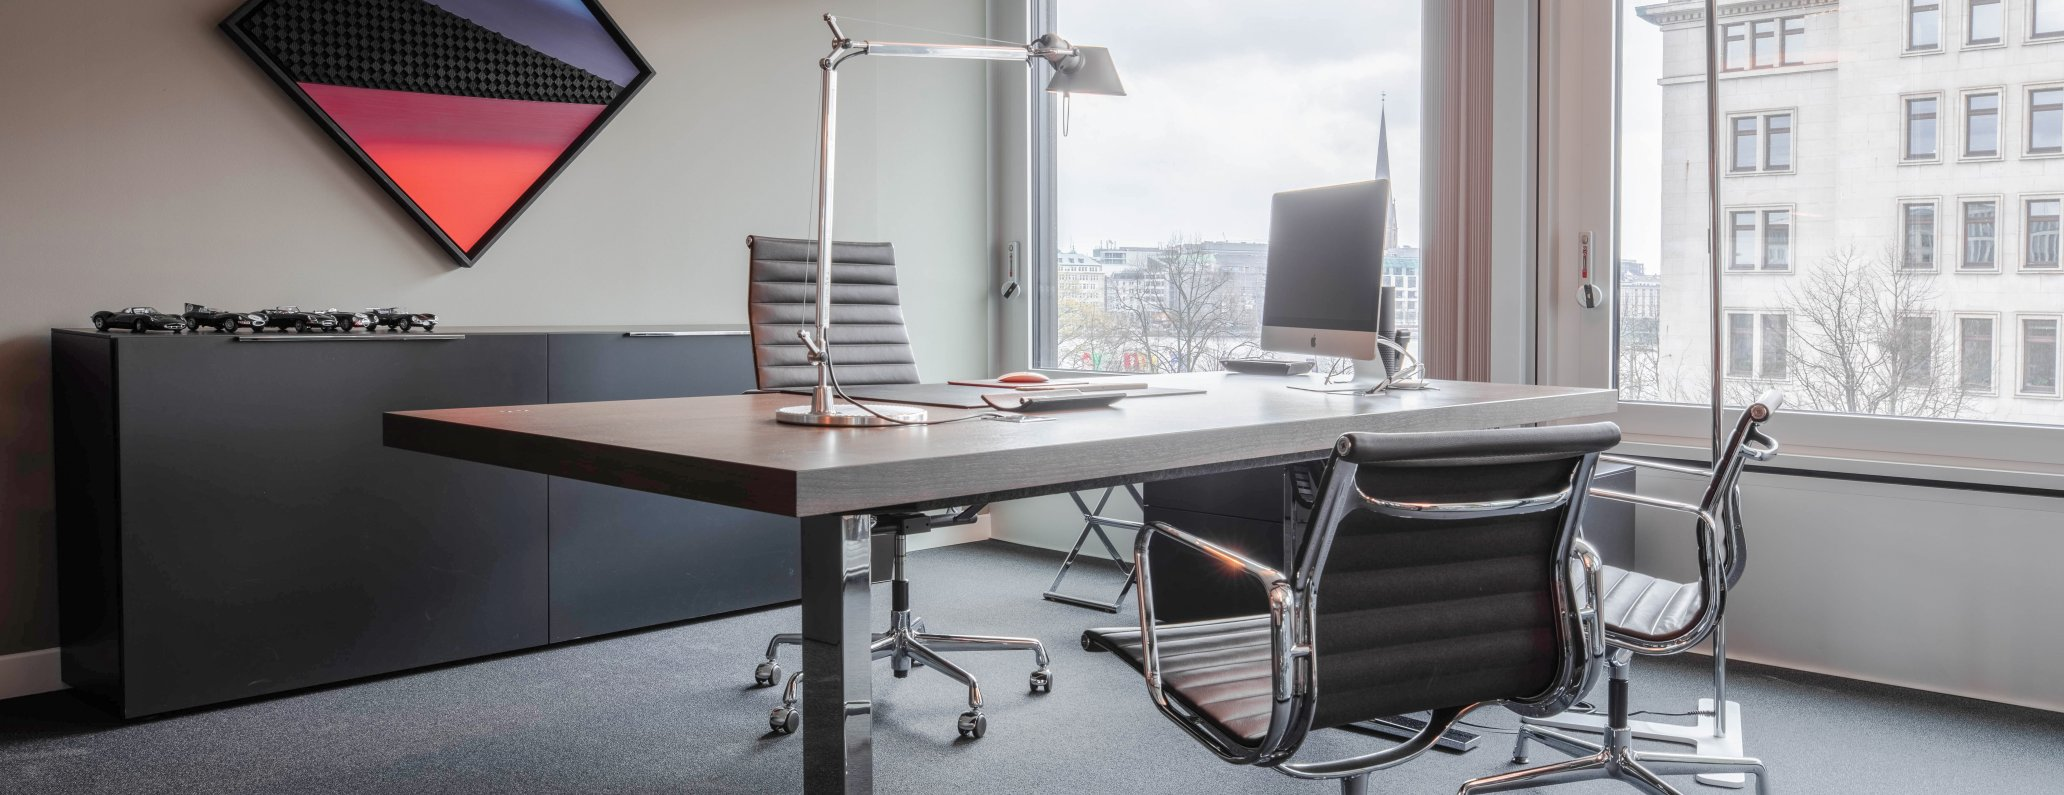 Büro Führungspersonal TKM Global, Hamburg